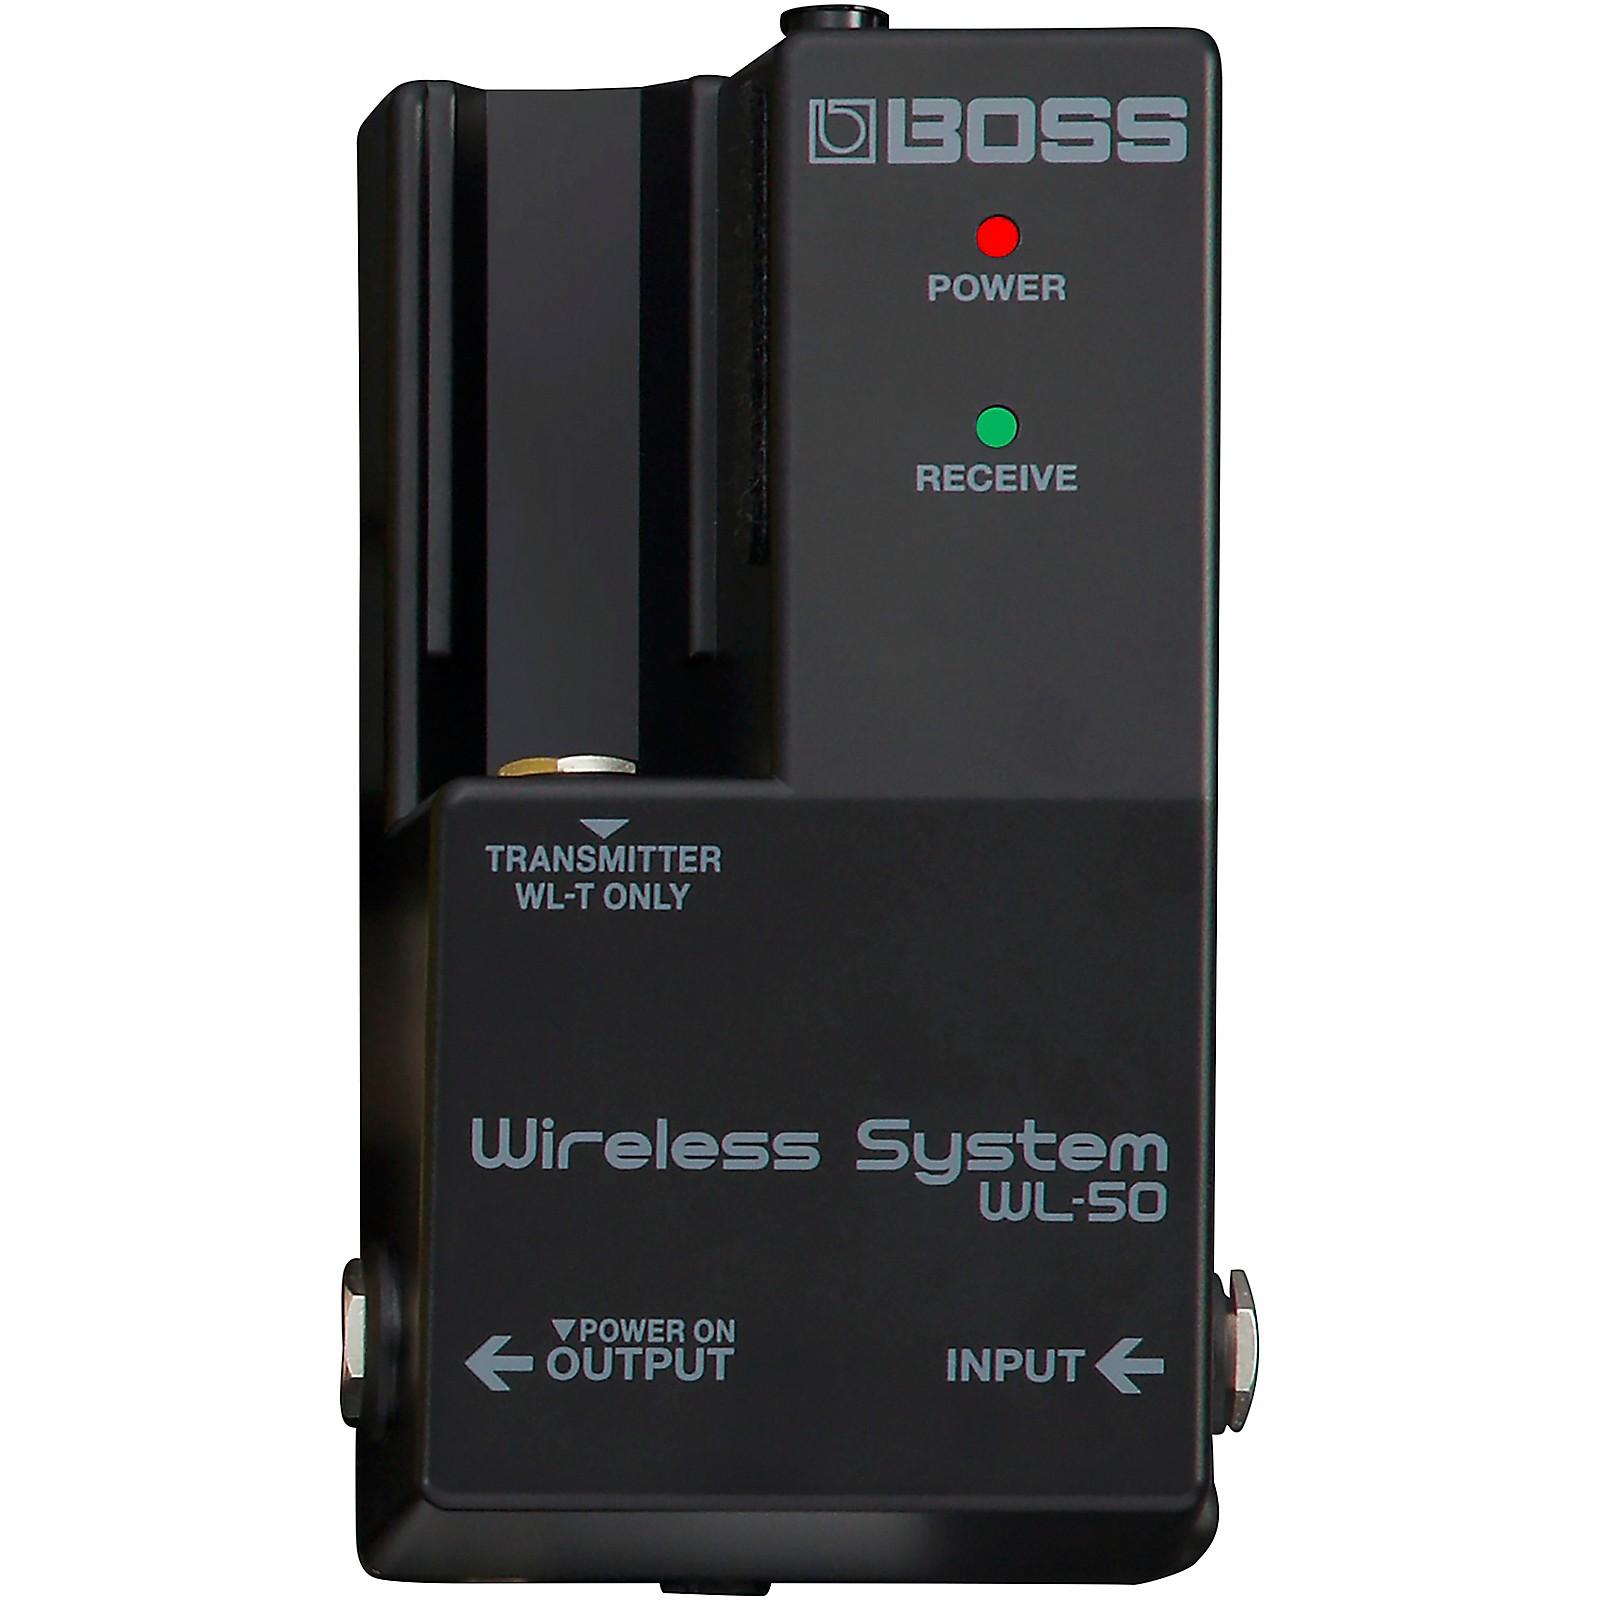 Boss WL-50 Guitar Wireless System